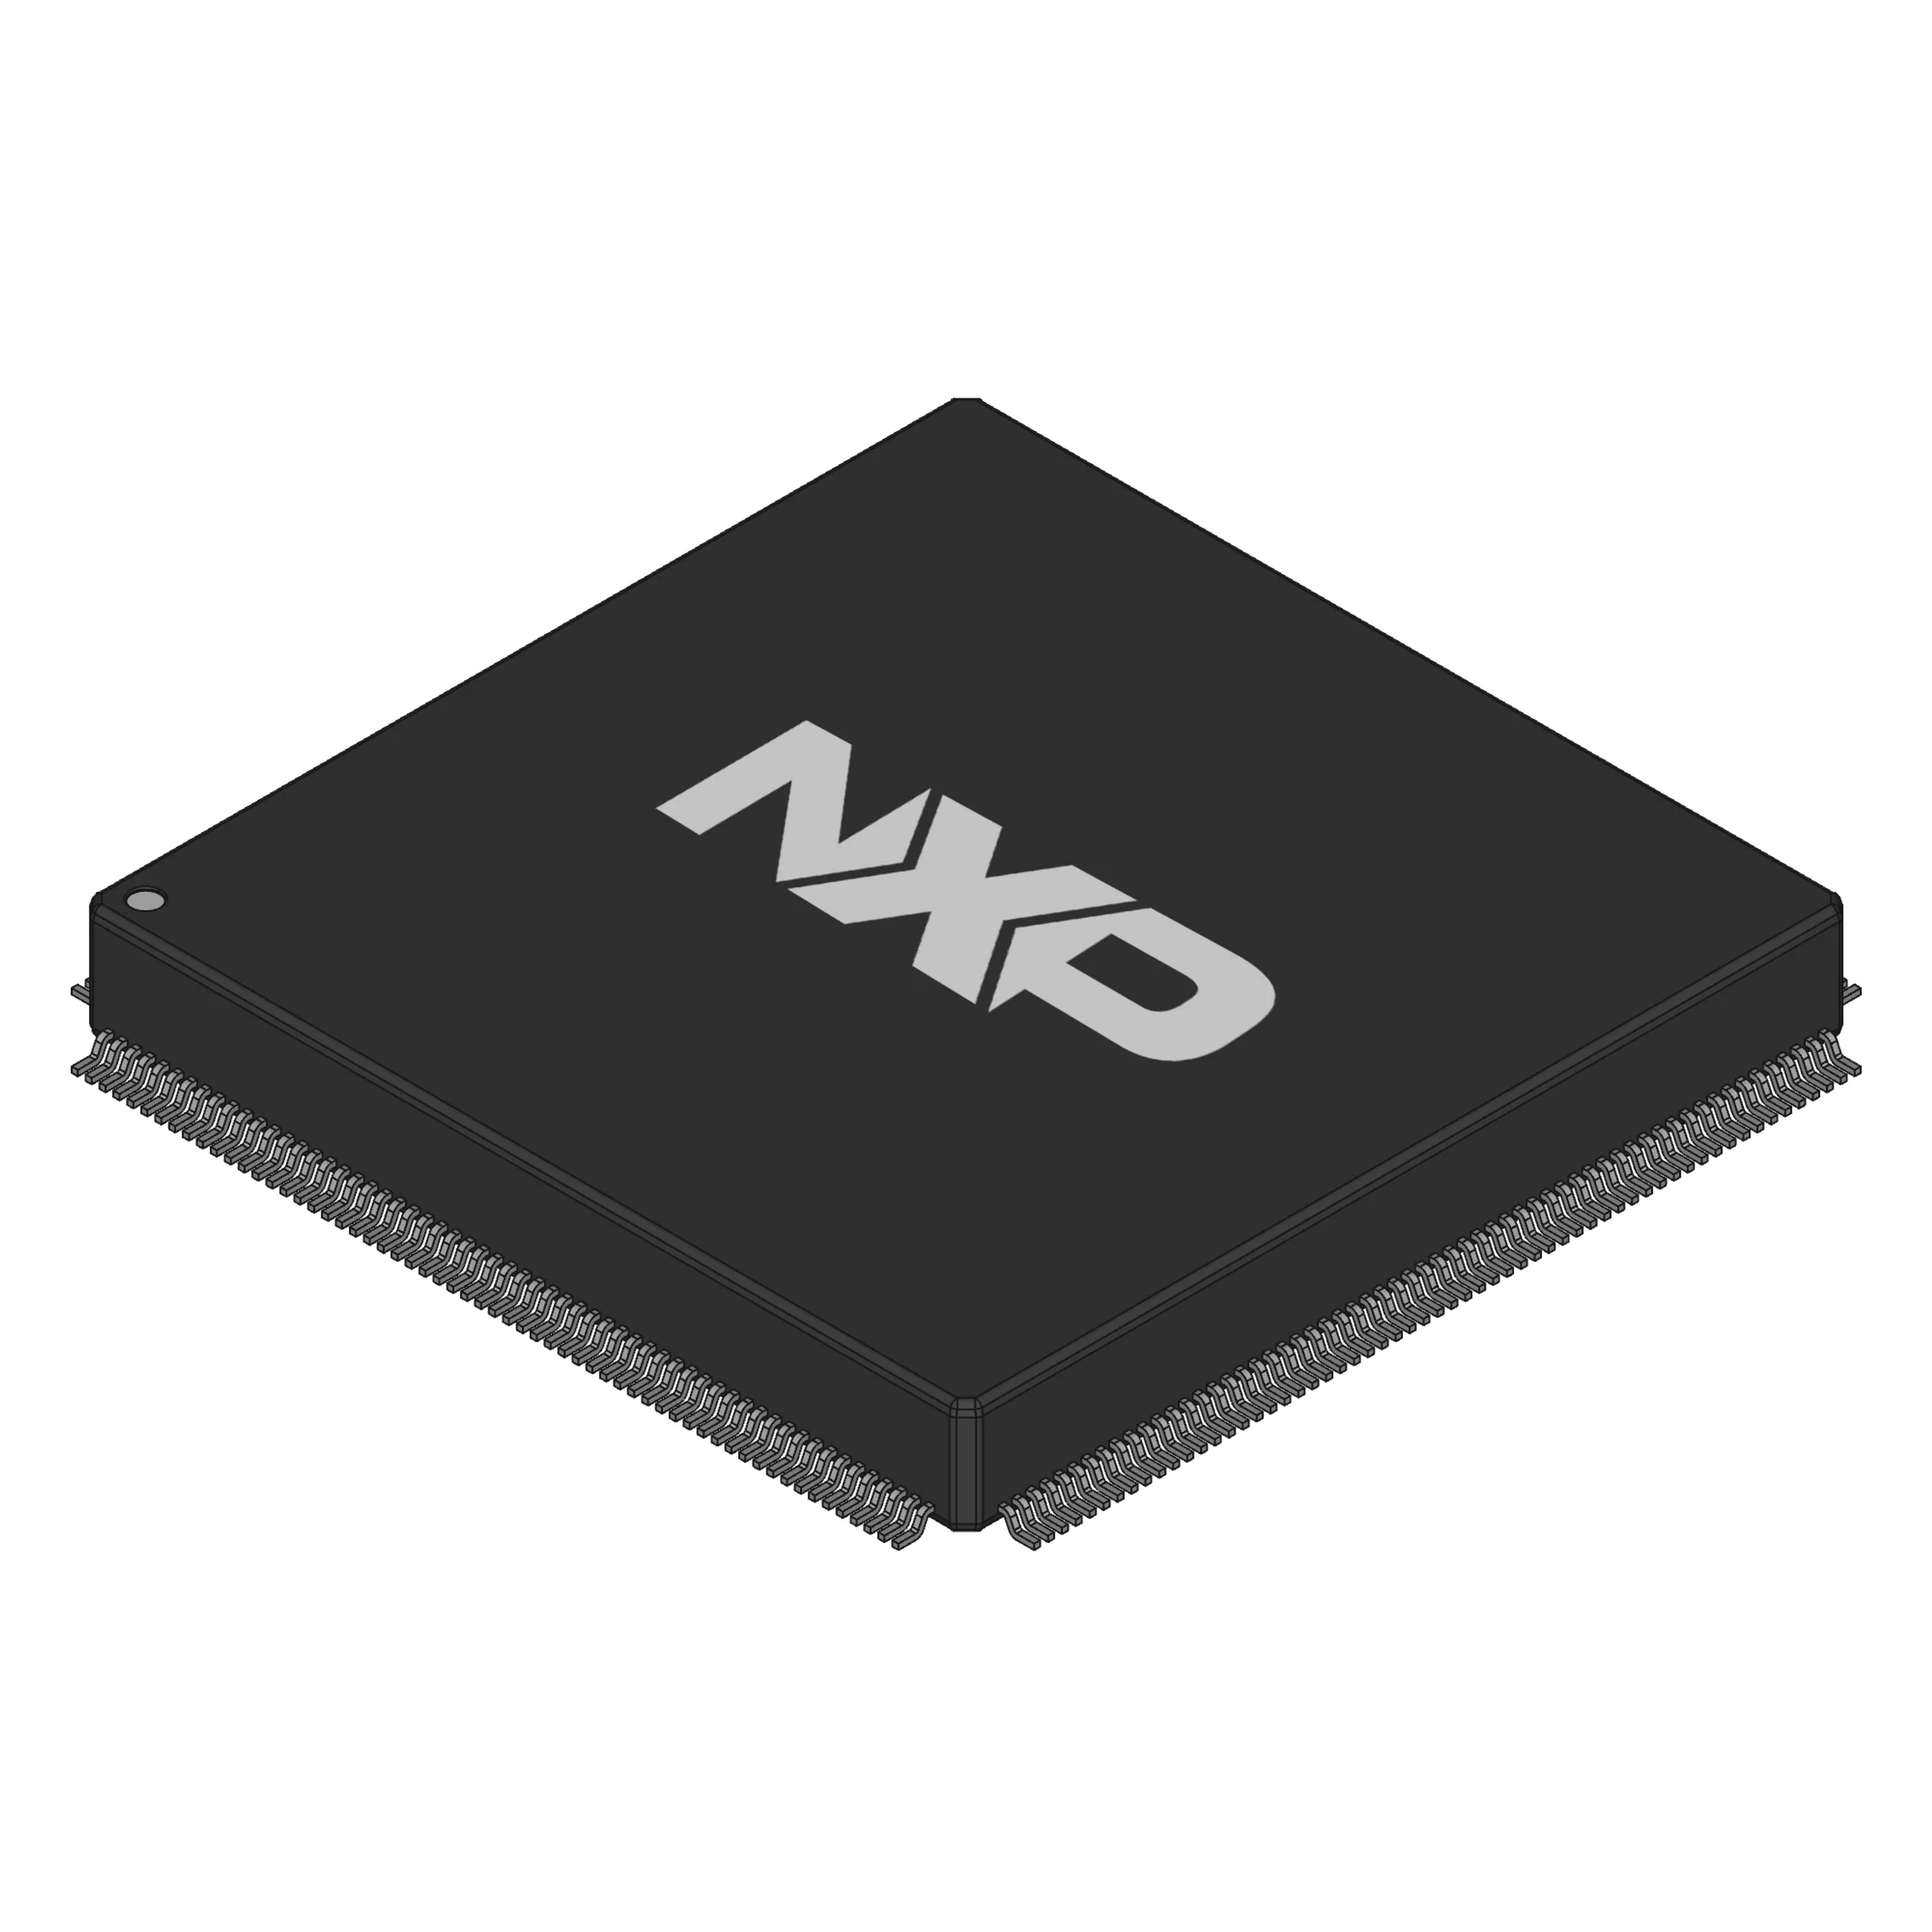 Image of Rochester Electronics' MC68EN360AI33L